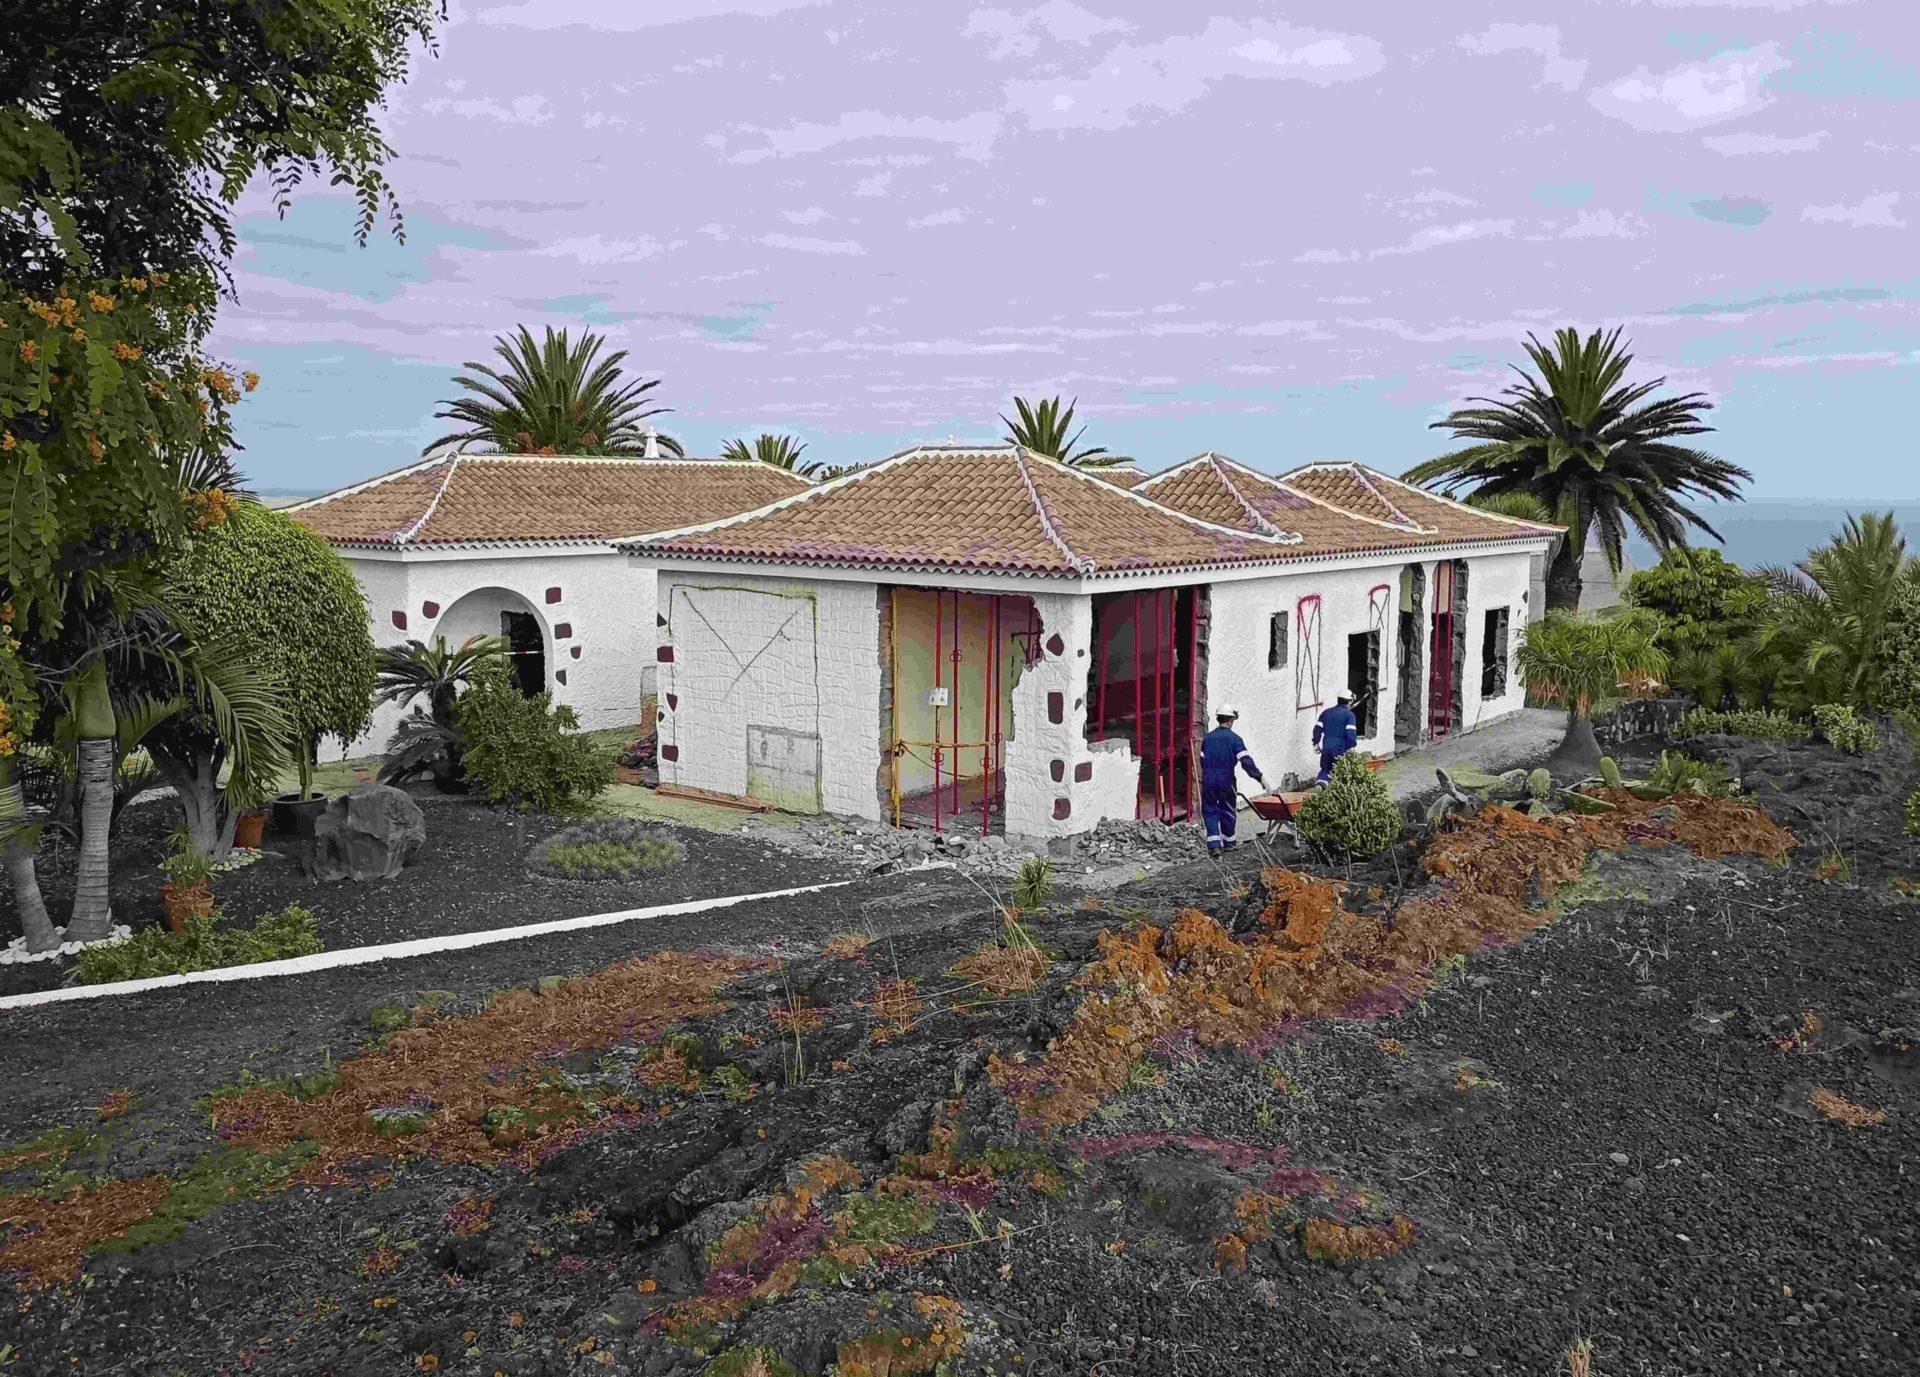 HCM home remodeling in Tenerife 2021